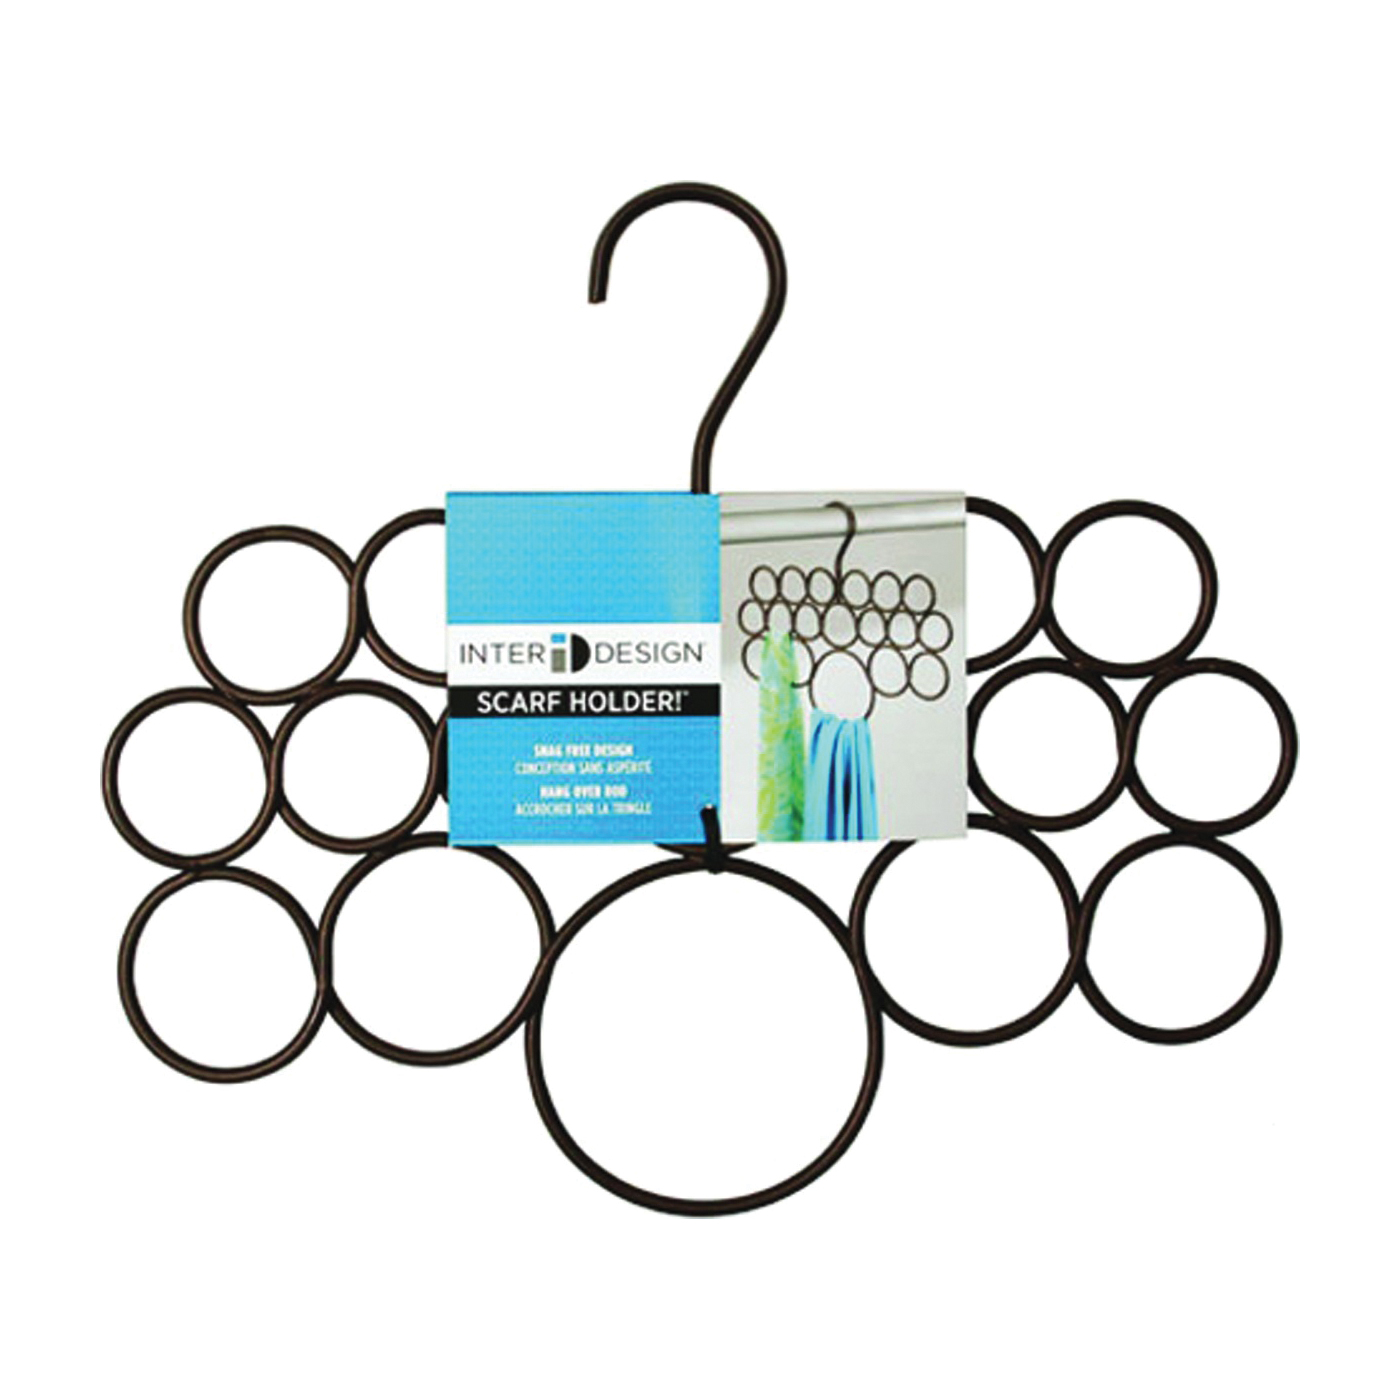 Picture of iDESIGN 24981 Scarf Hanger, Steel, Black